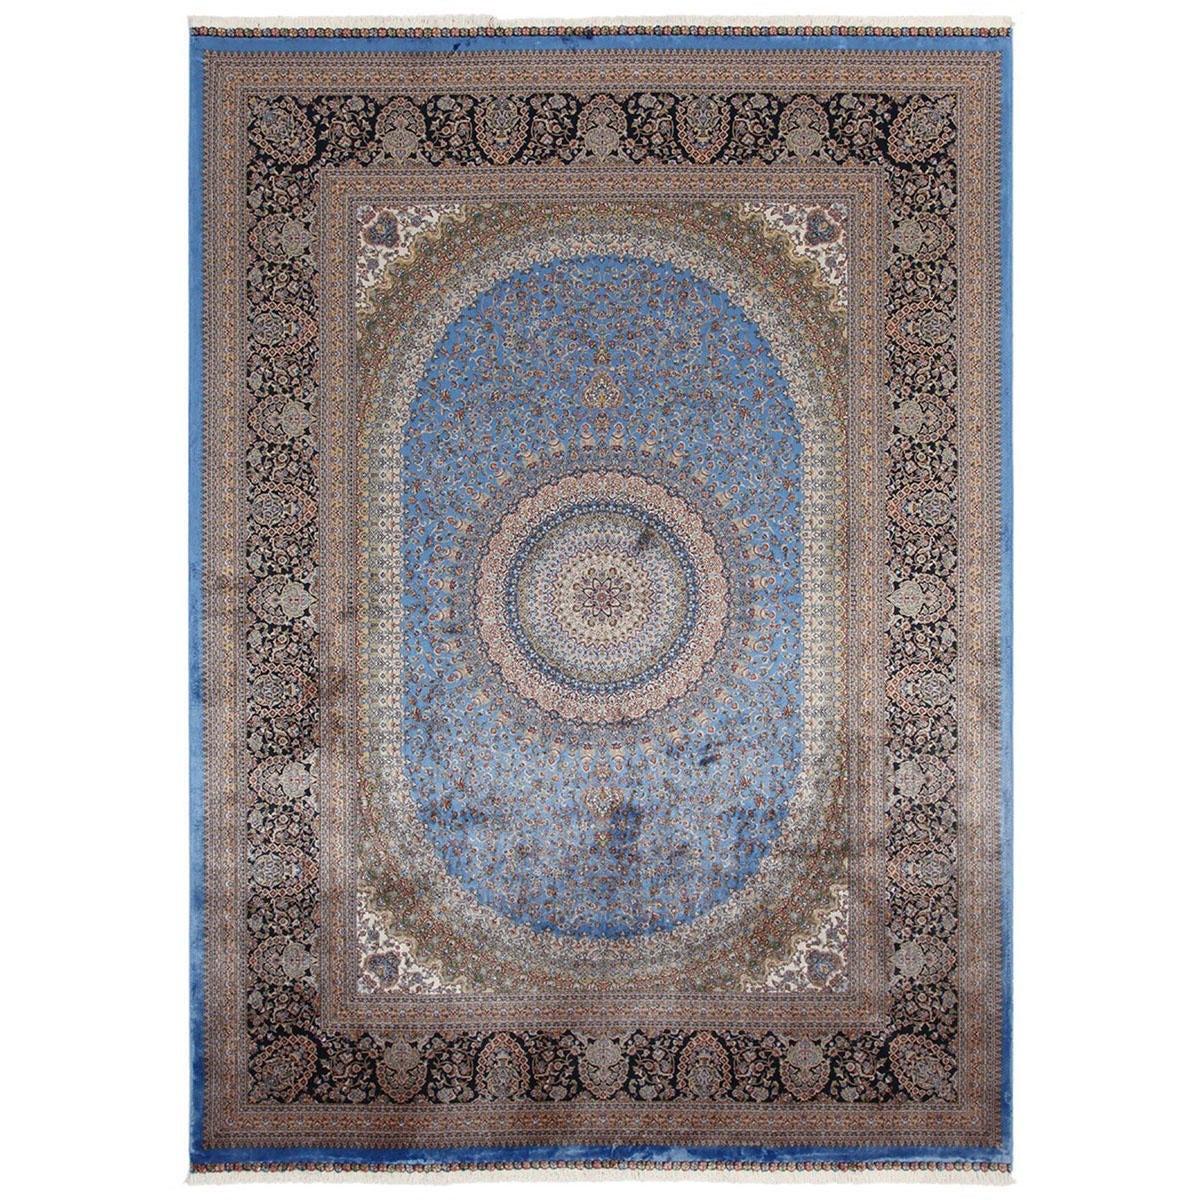 Tappeto Qoum Shah 5 in cotone, blu, 200x290 - 1